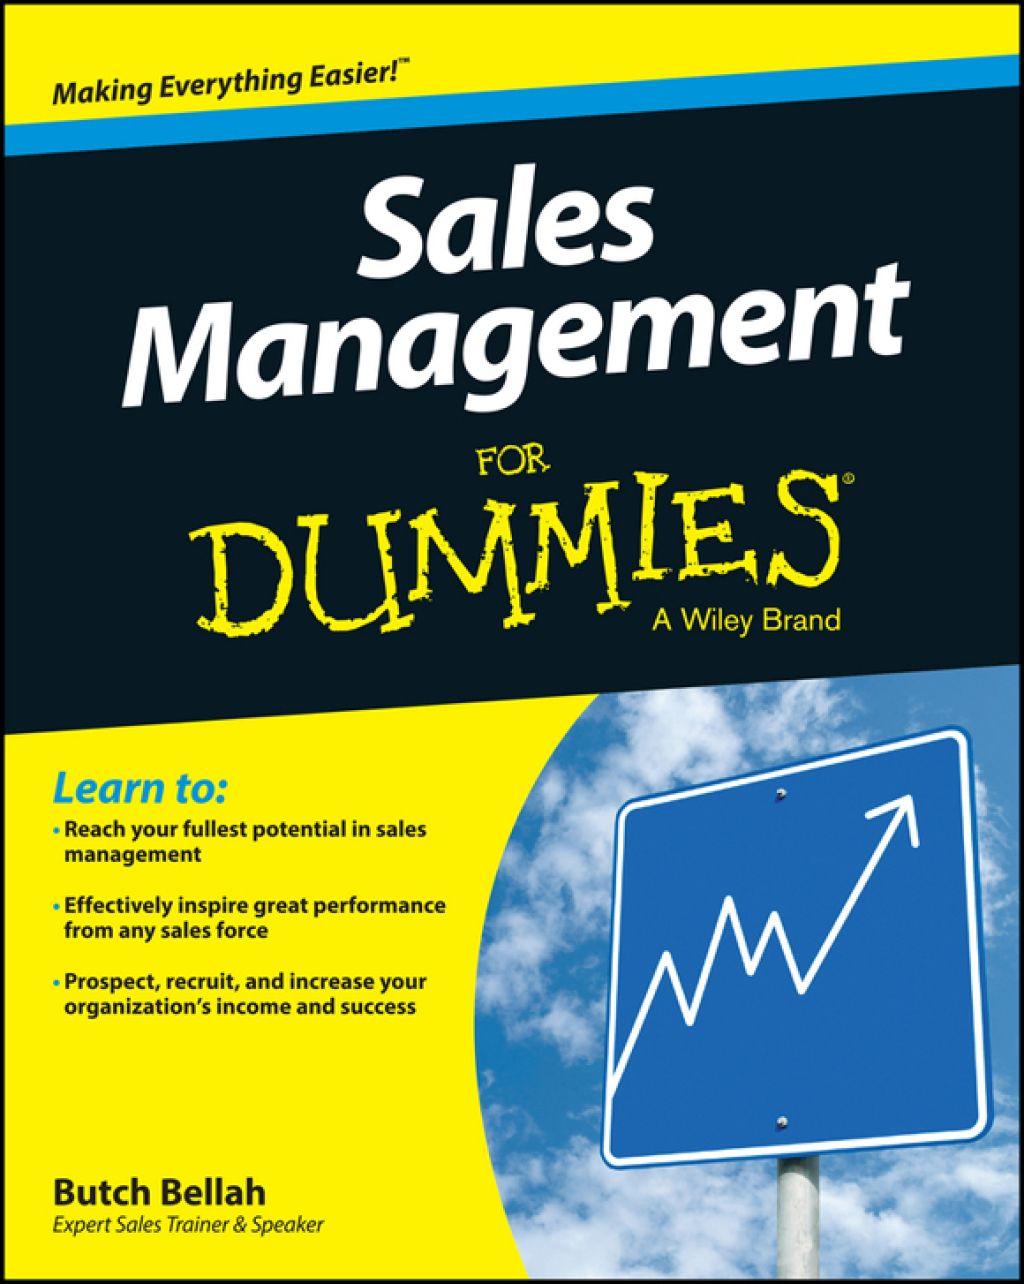 Sales Management For Dummies (eBook) Dummies book, Sales